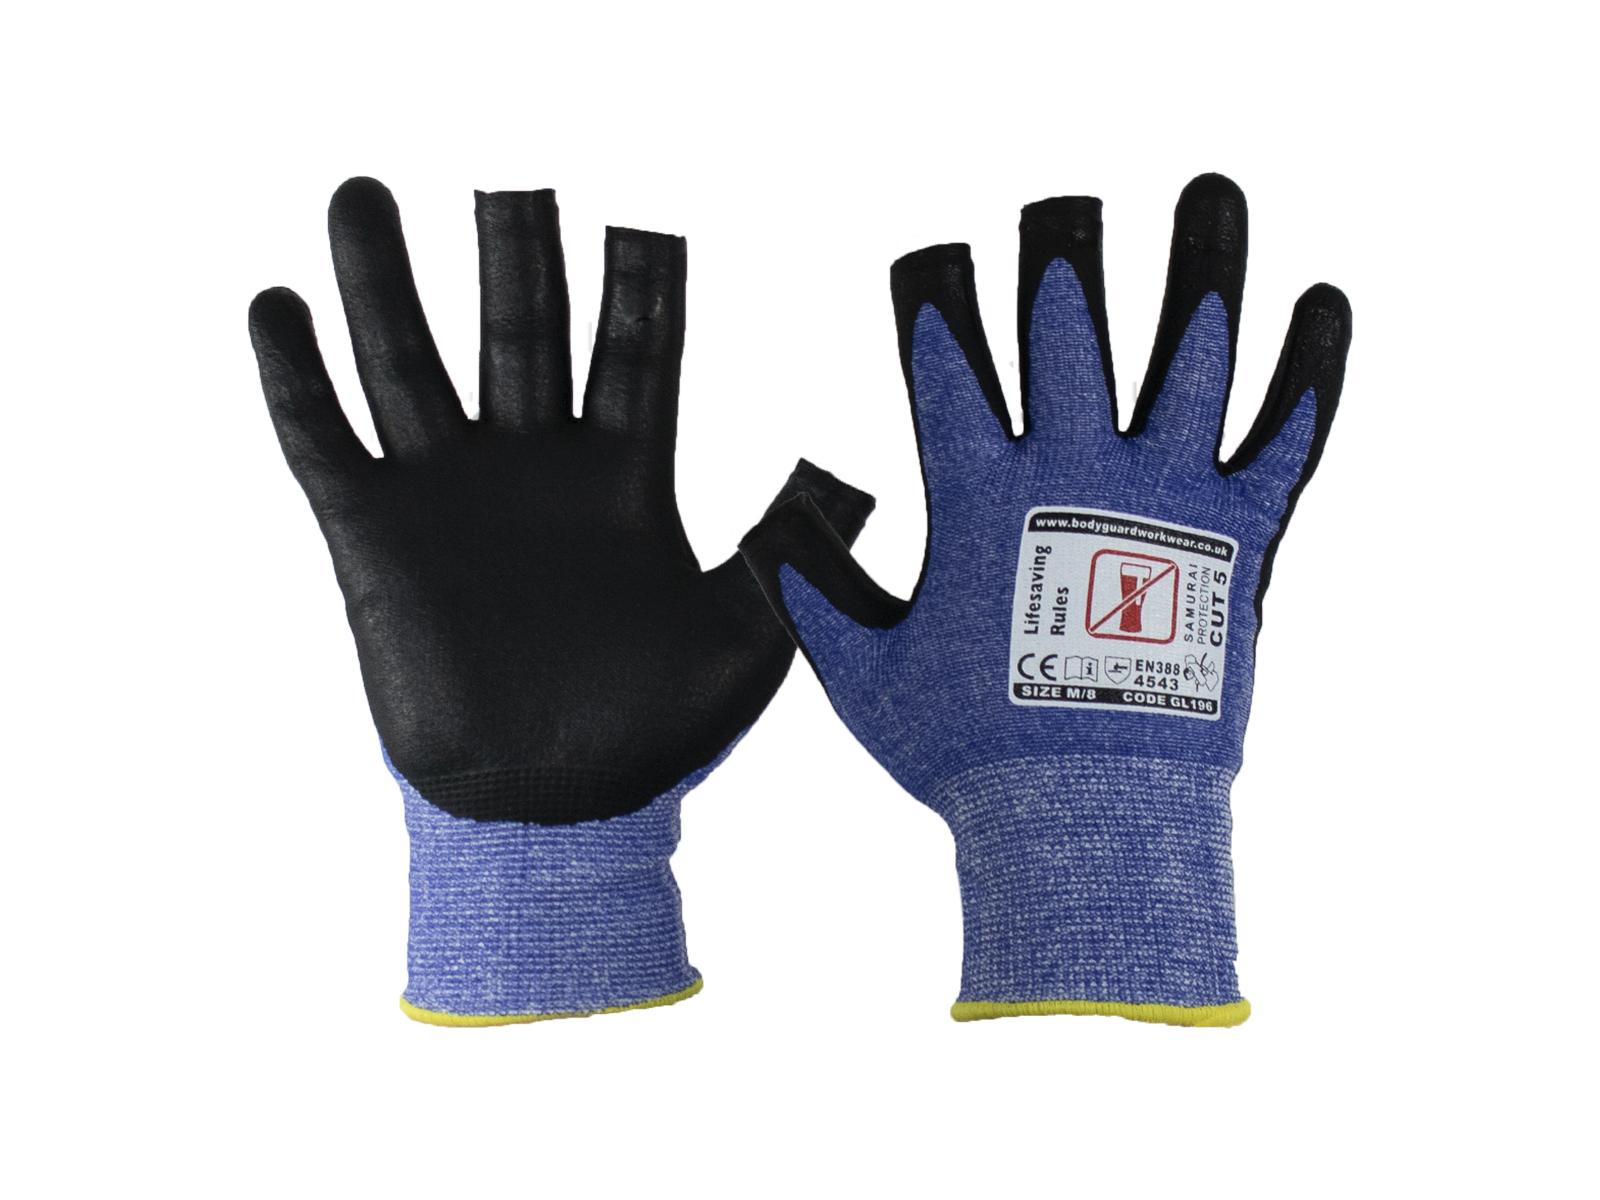 3 Digit Samurai Lite Cut 5 Safety Glove w/ fingertip contact -2